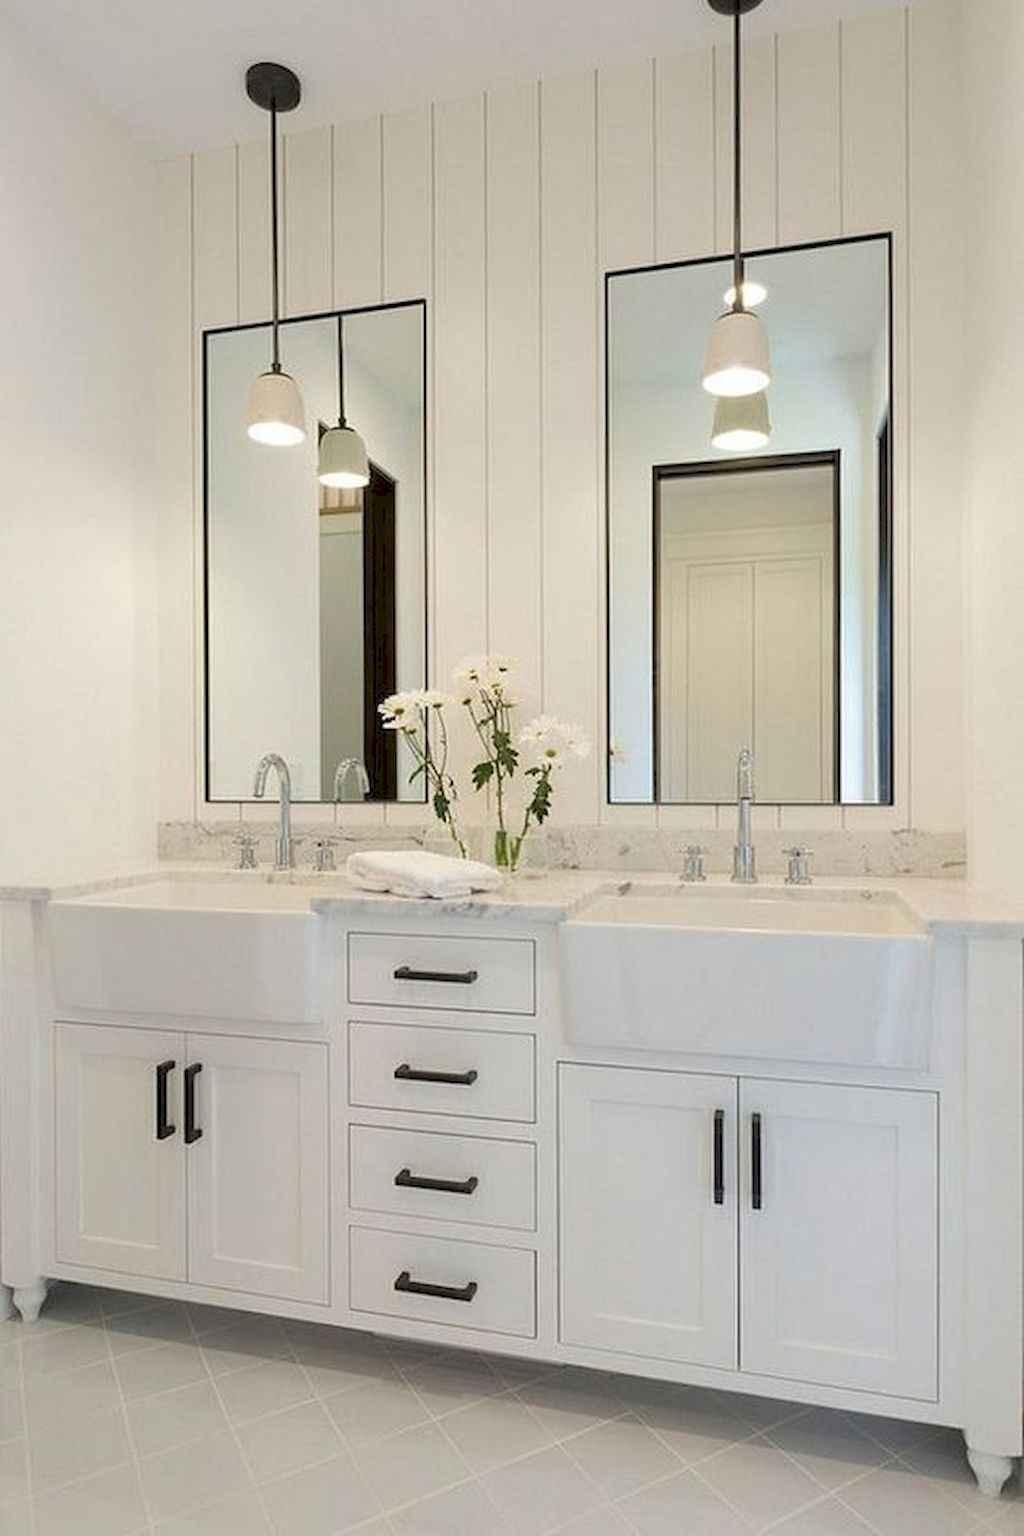 125 awesome farmhouse bathroom vanity remodel ideas (112)